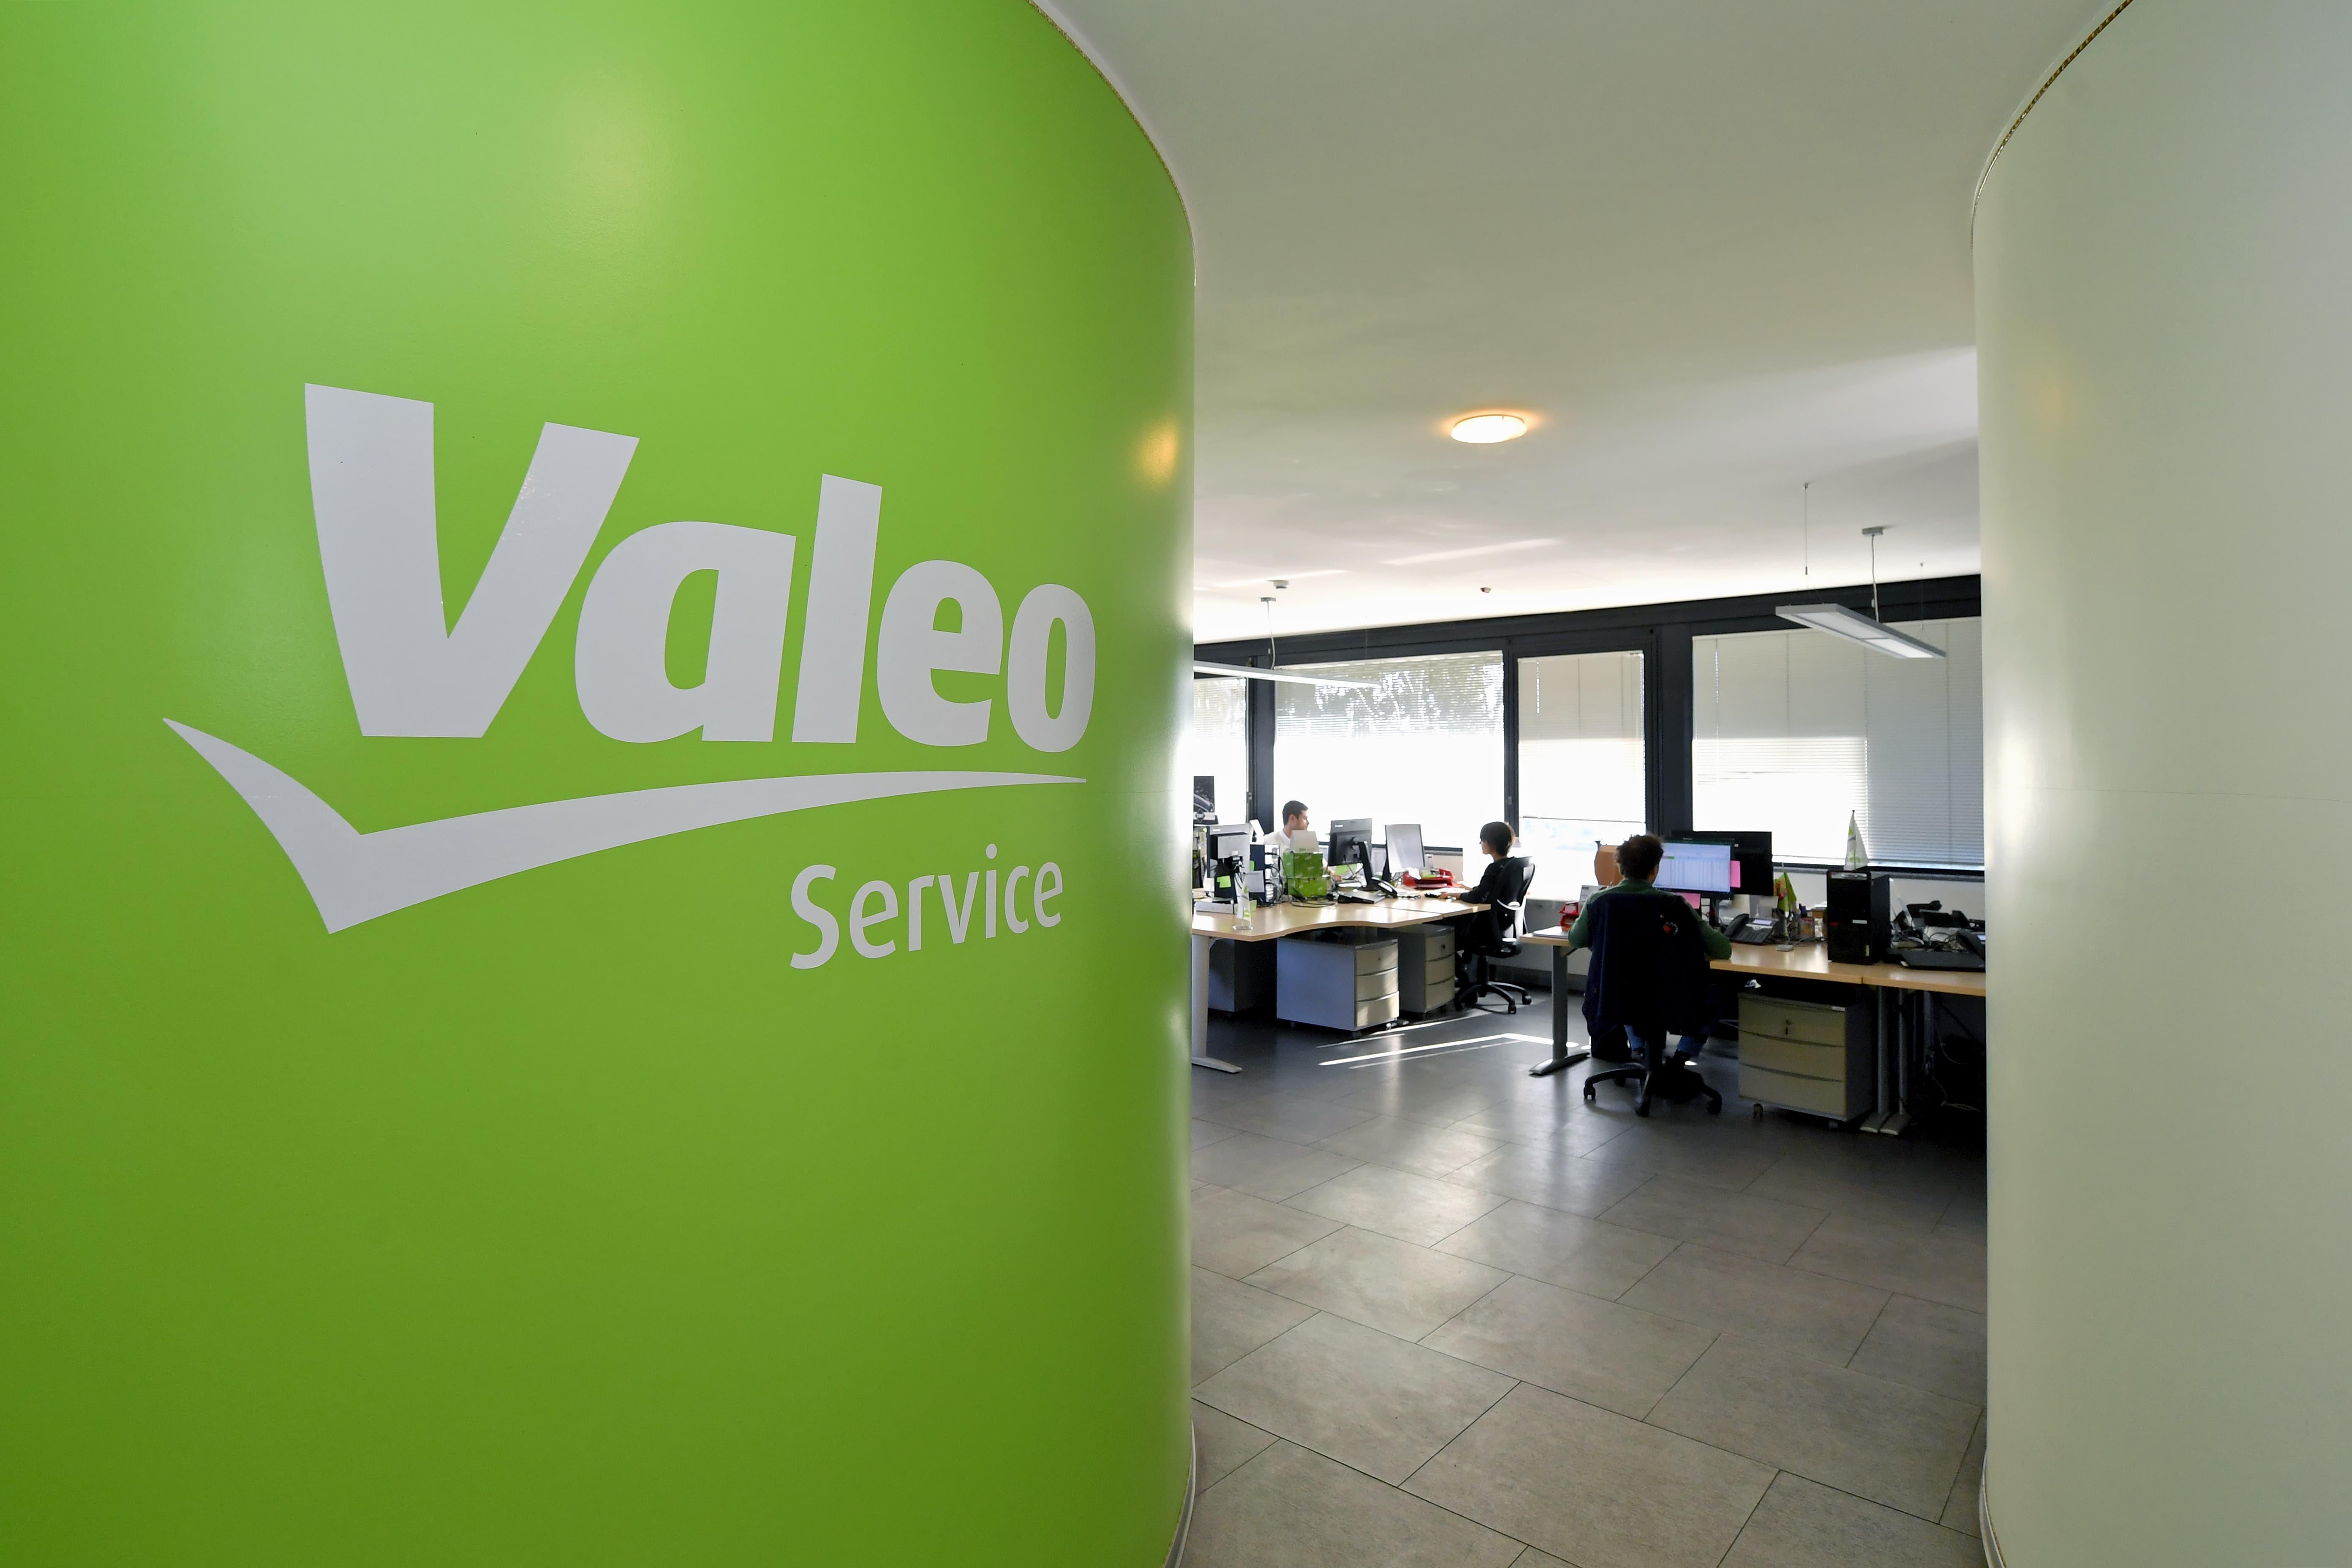 Valeo workers in Italy Santena